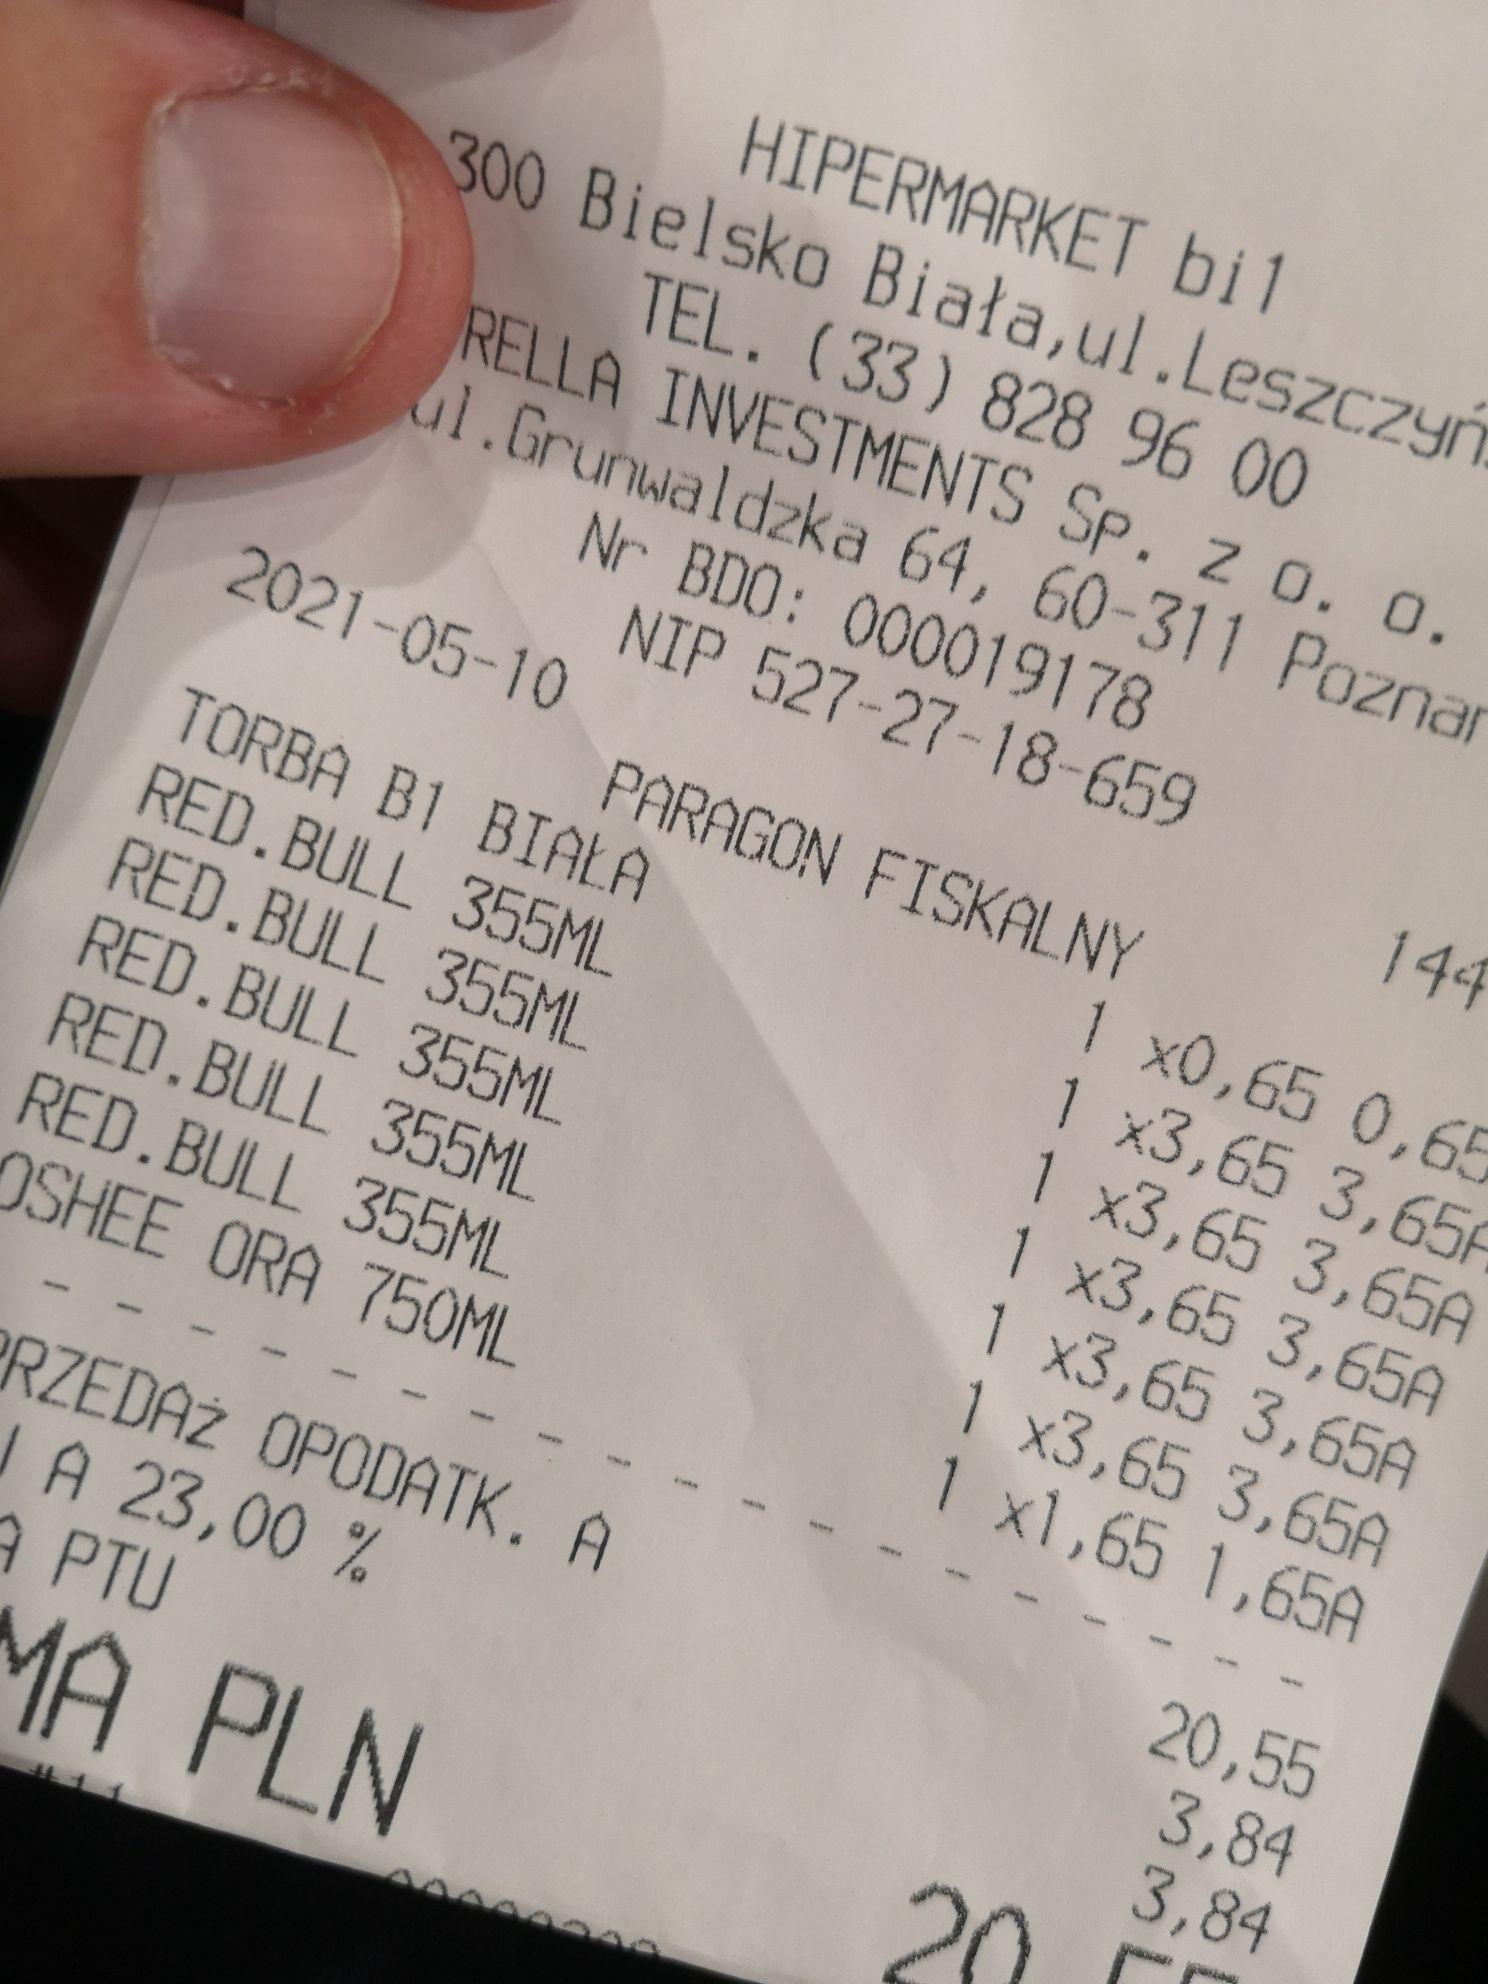 Red Bull 355 ml @ Bi1